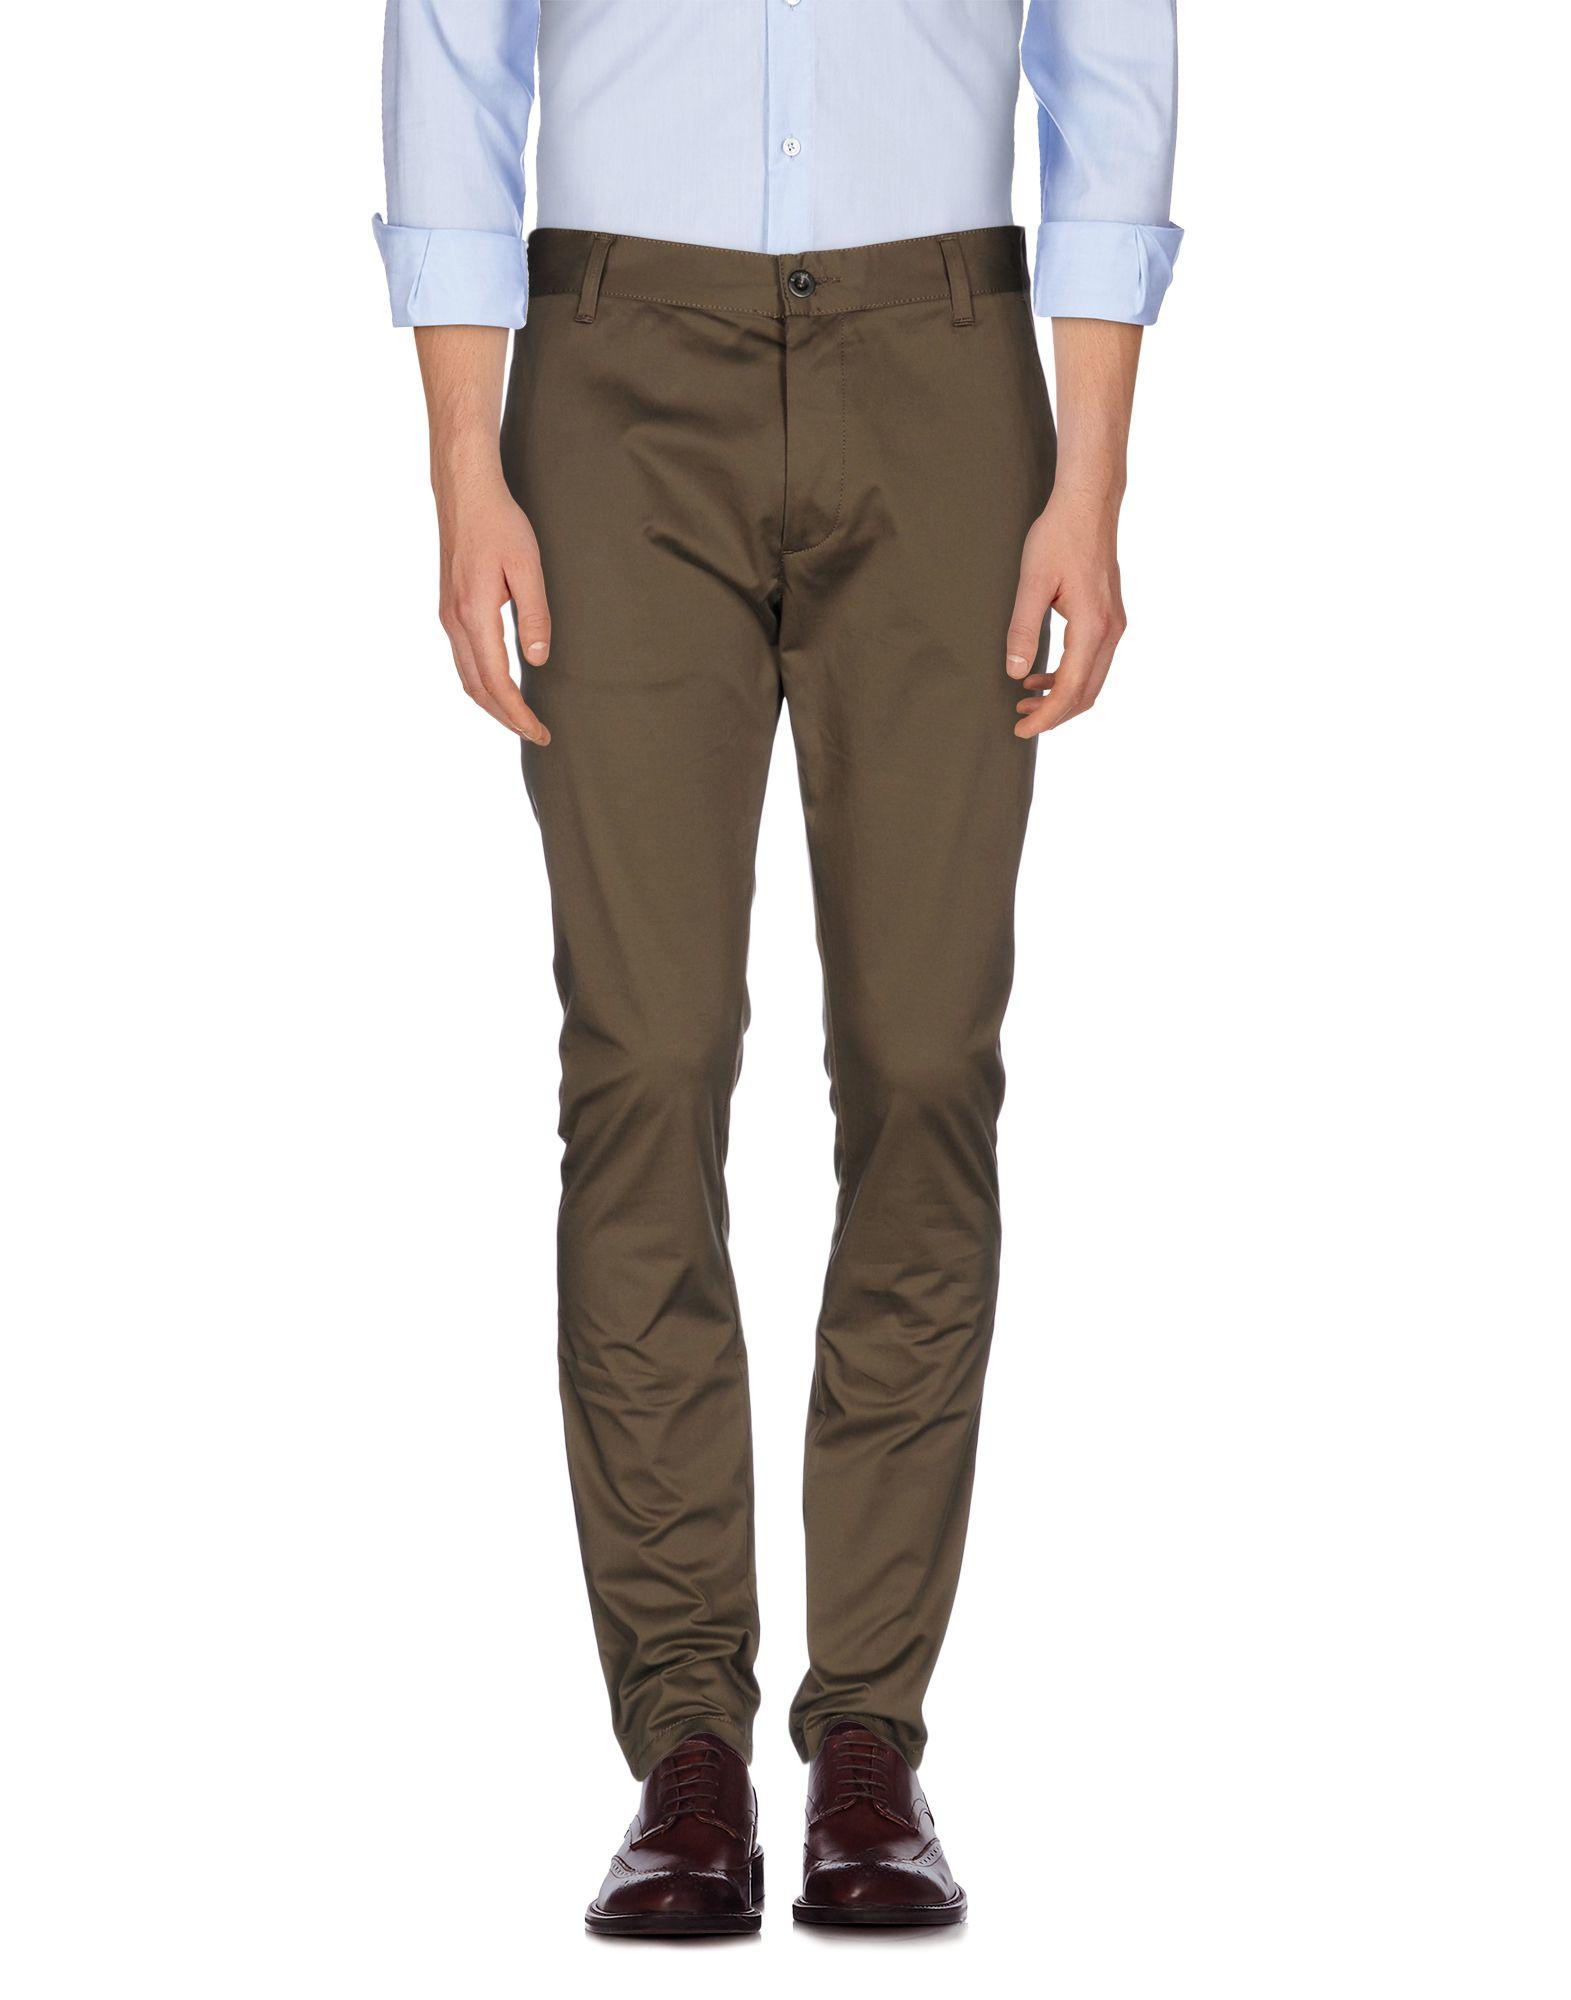 John Galliano Casual Trouser In Green For Men Lyst